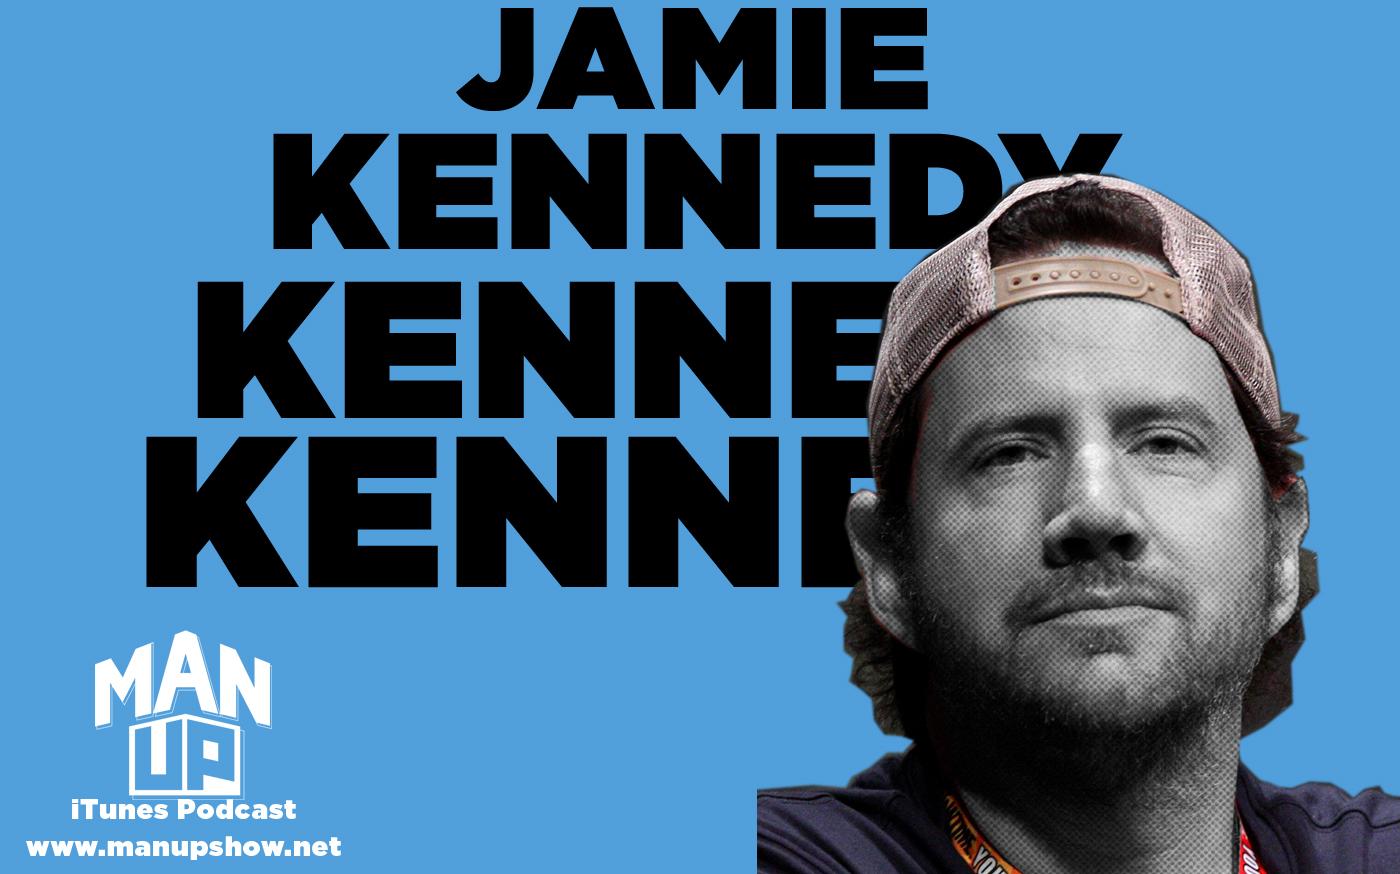 Jamie Kennedy on Man Up